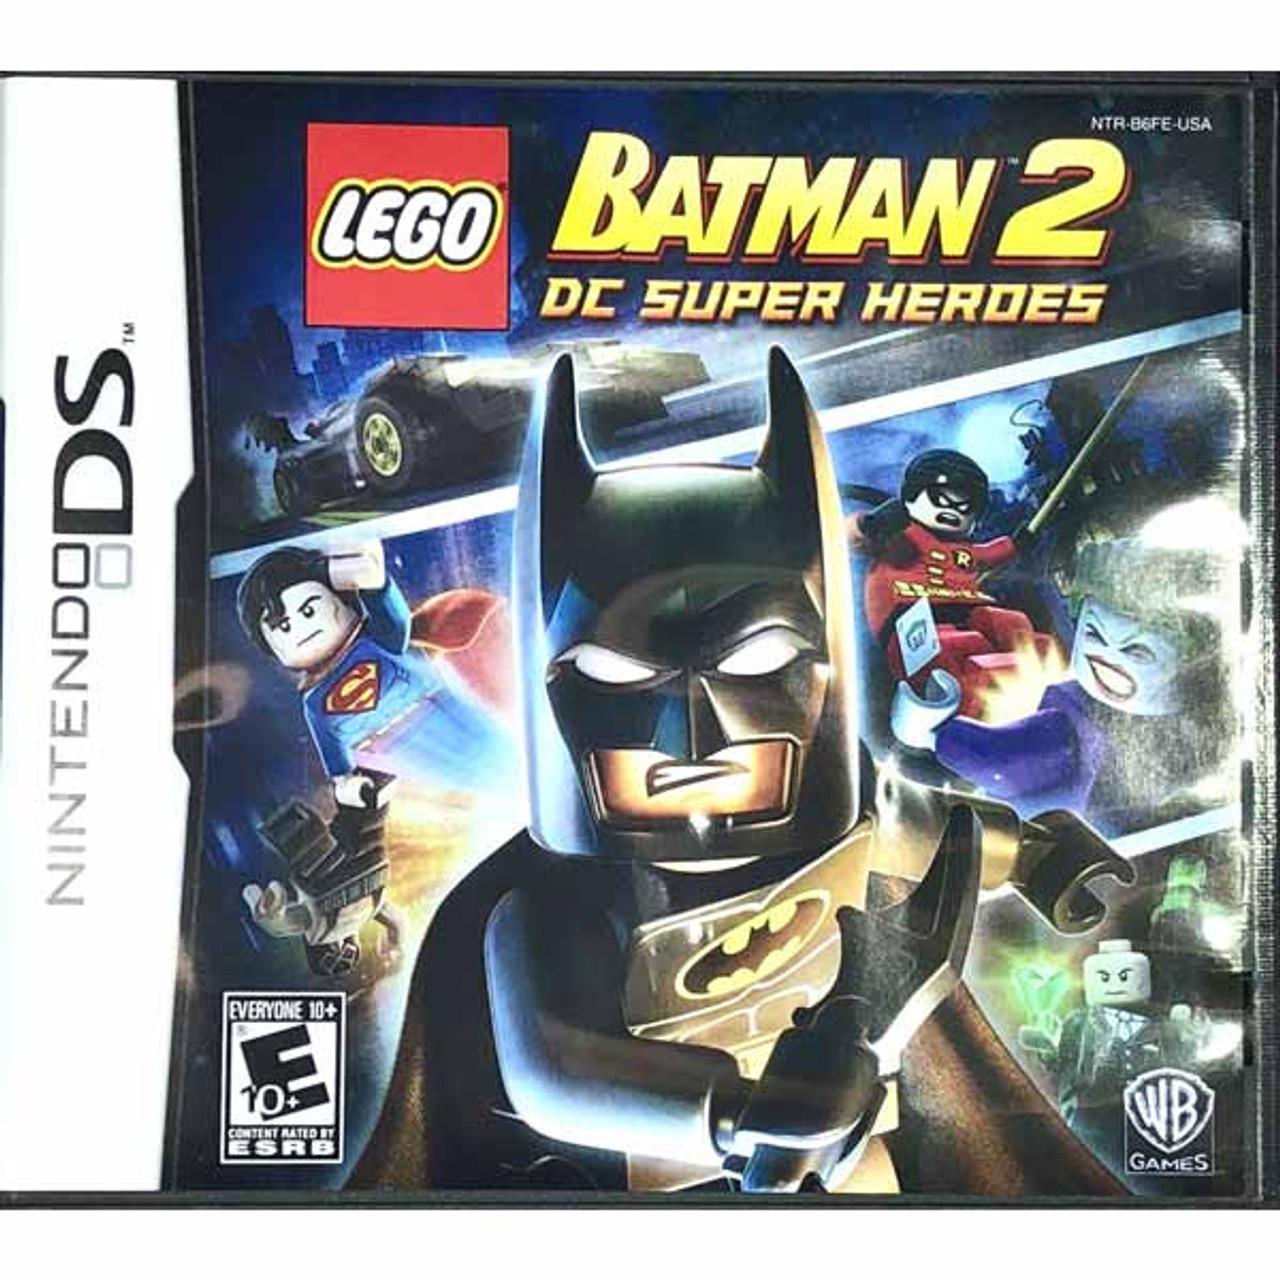 Lego Batman 2 DC Super Heroes Nintendo DS game for sale